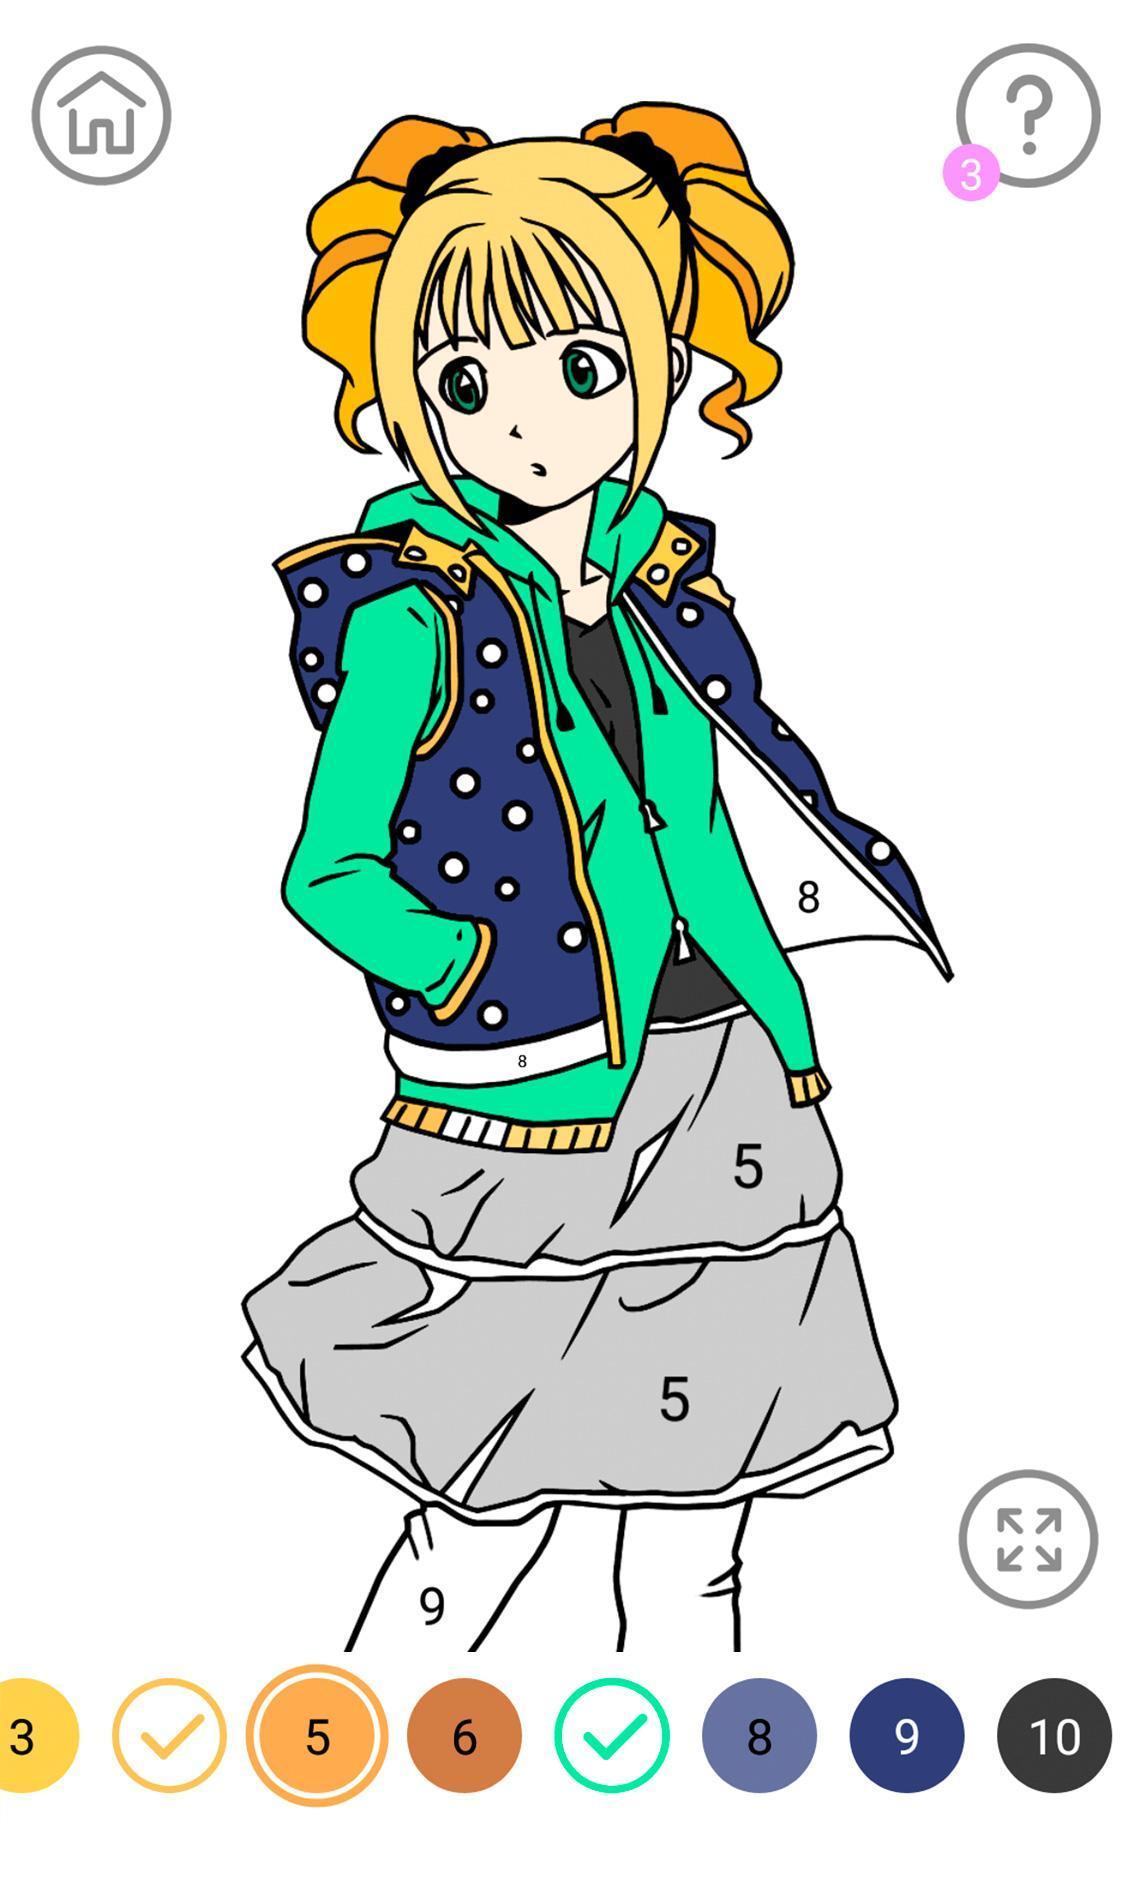 Anime Juegos Para Colorear For Android Apk Download